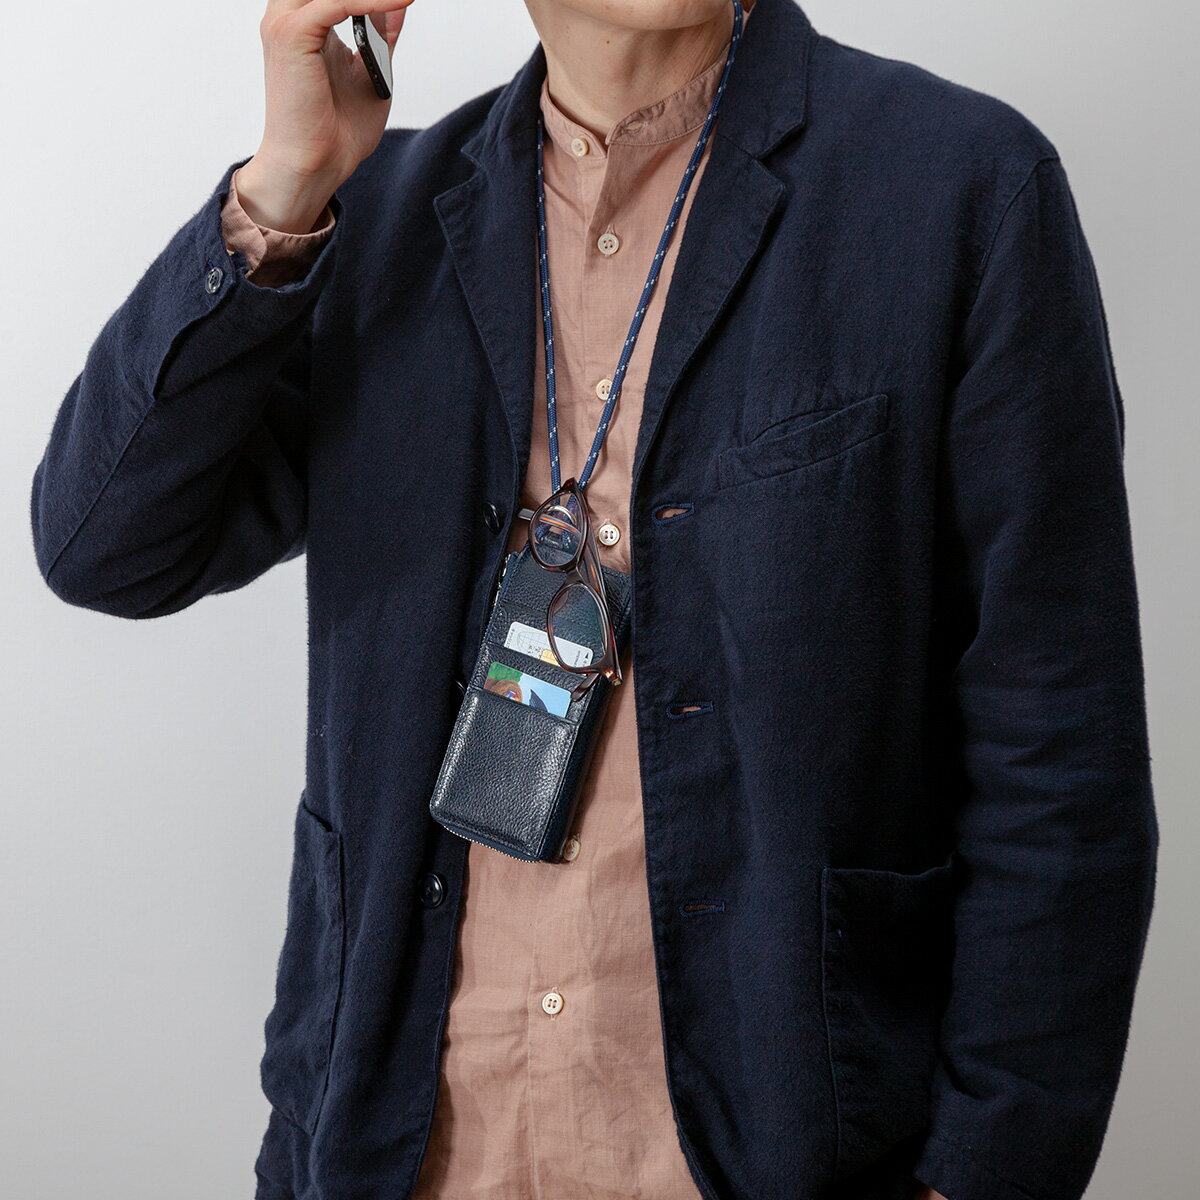 Totem Re Vooo(トーテムリボー) ネックウォレット スマホケース 長財布 L字ファスナー財布 首掛け * レディース メンズ イタリアンレザー 本革 日本製 豊岡財布 ネイビー・紺/ワイン TRV0205W ARTPHERE